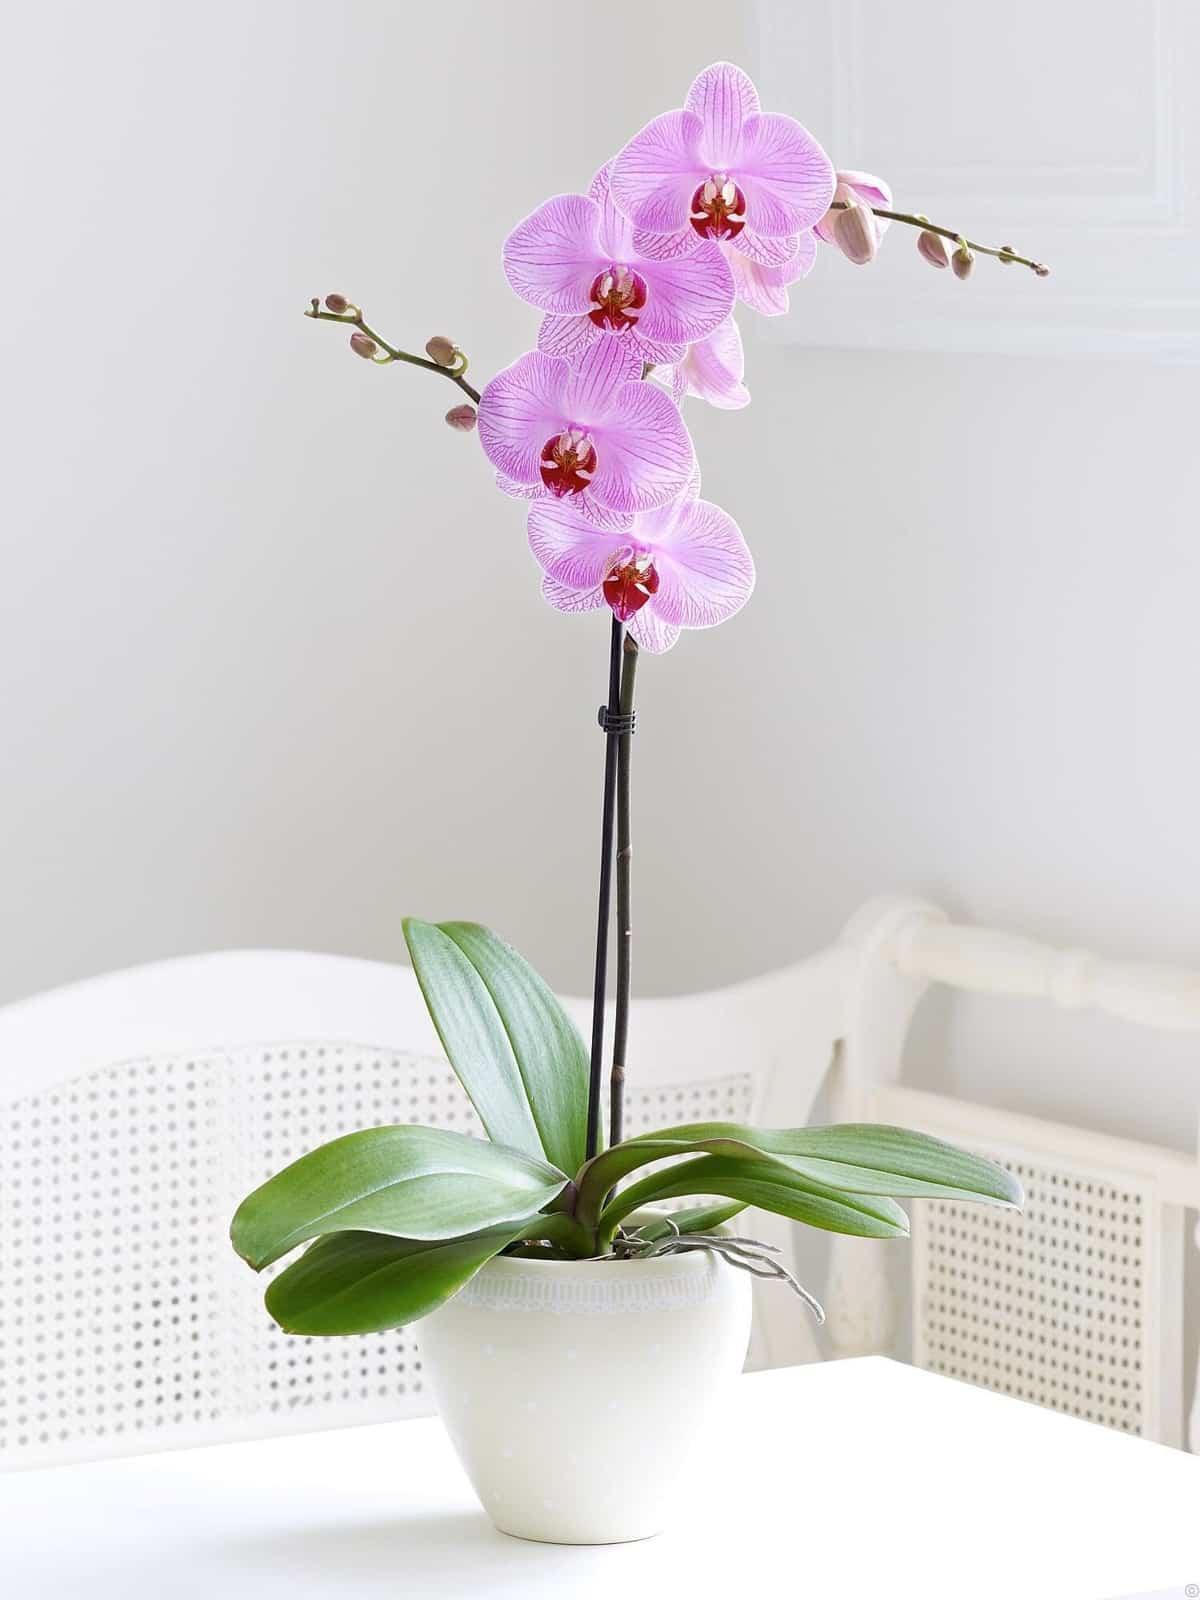 claves para decorar con orquideas tu hogar 6